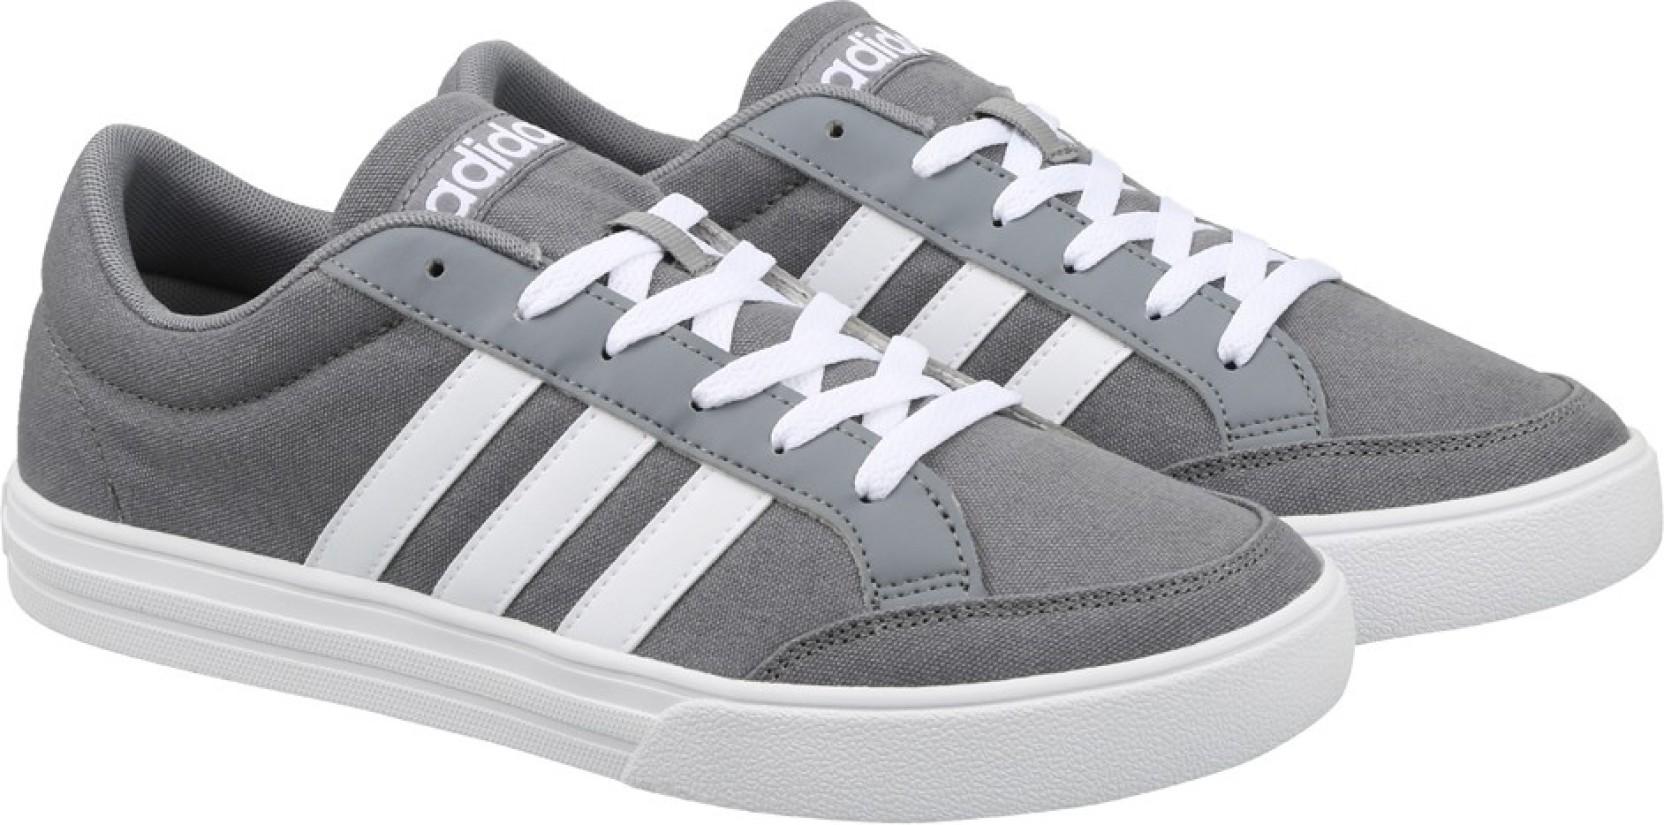 ADIDAS NEO VS SET Sneakers For Men - Buy GREY FTWWHT FTWWHT Color ... 571e52fb55a46